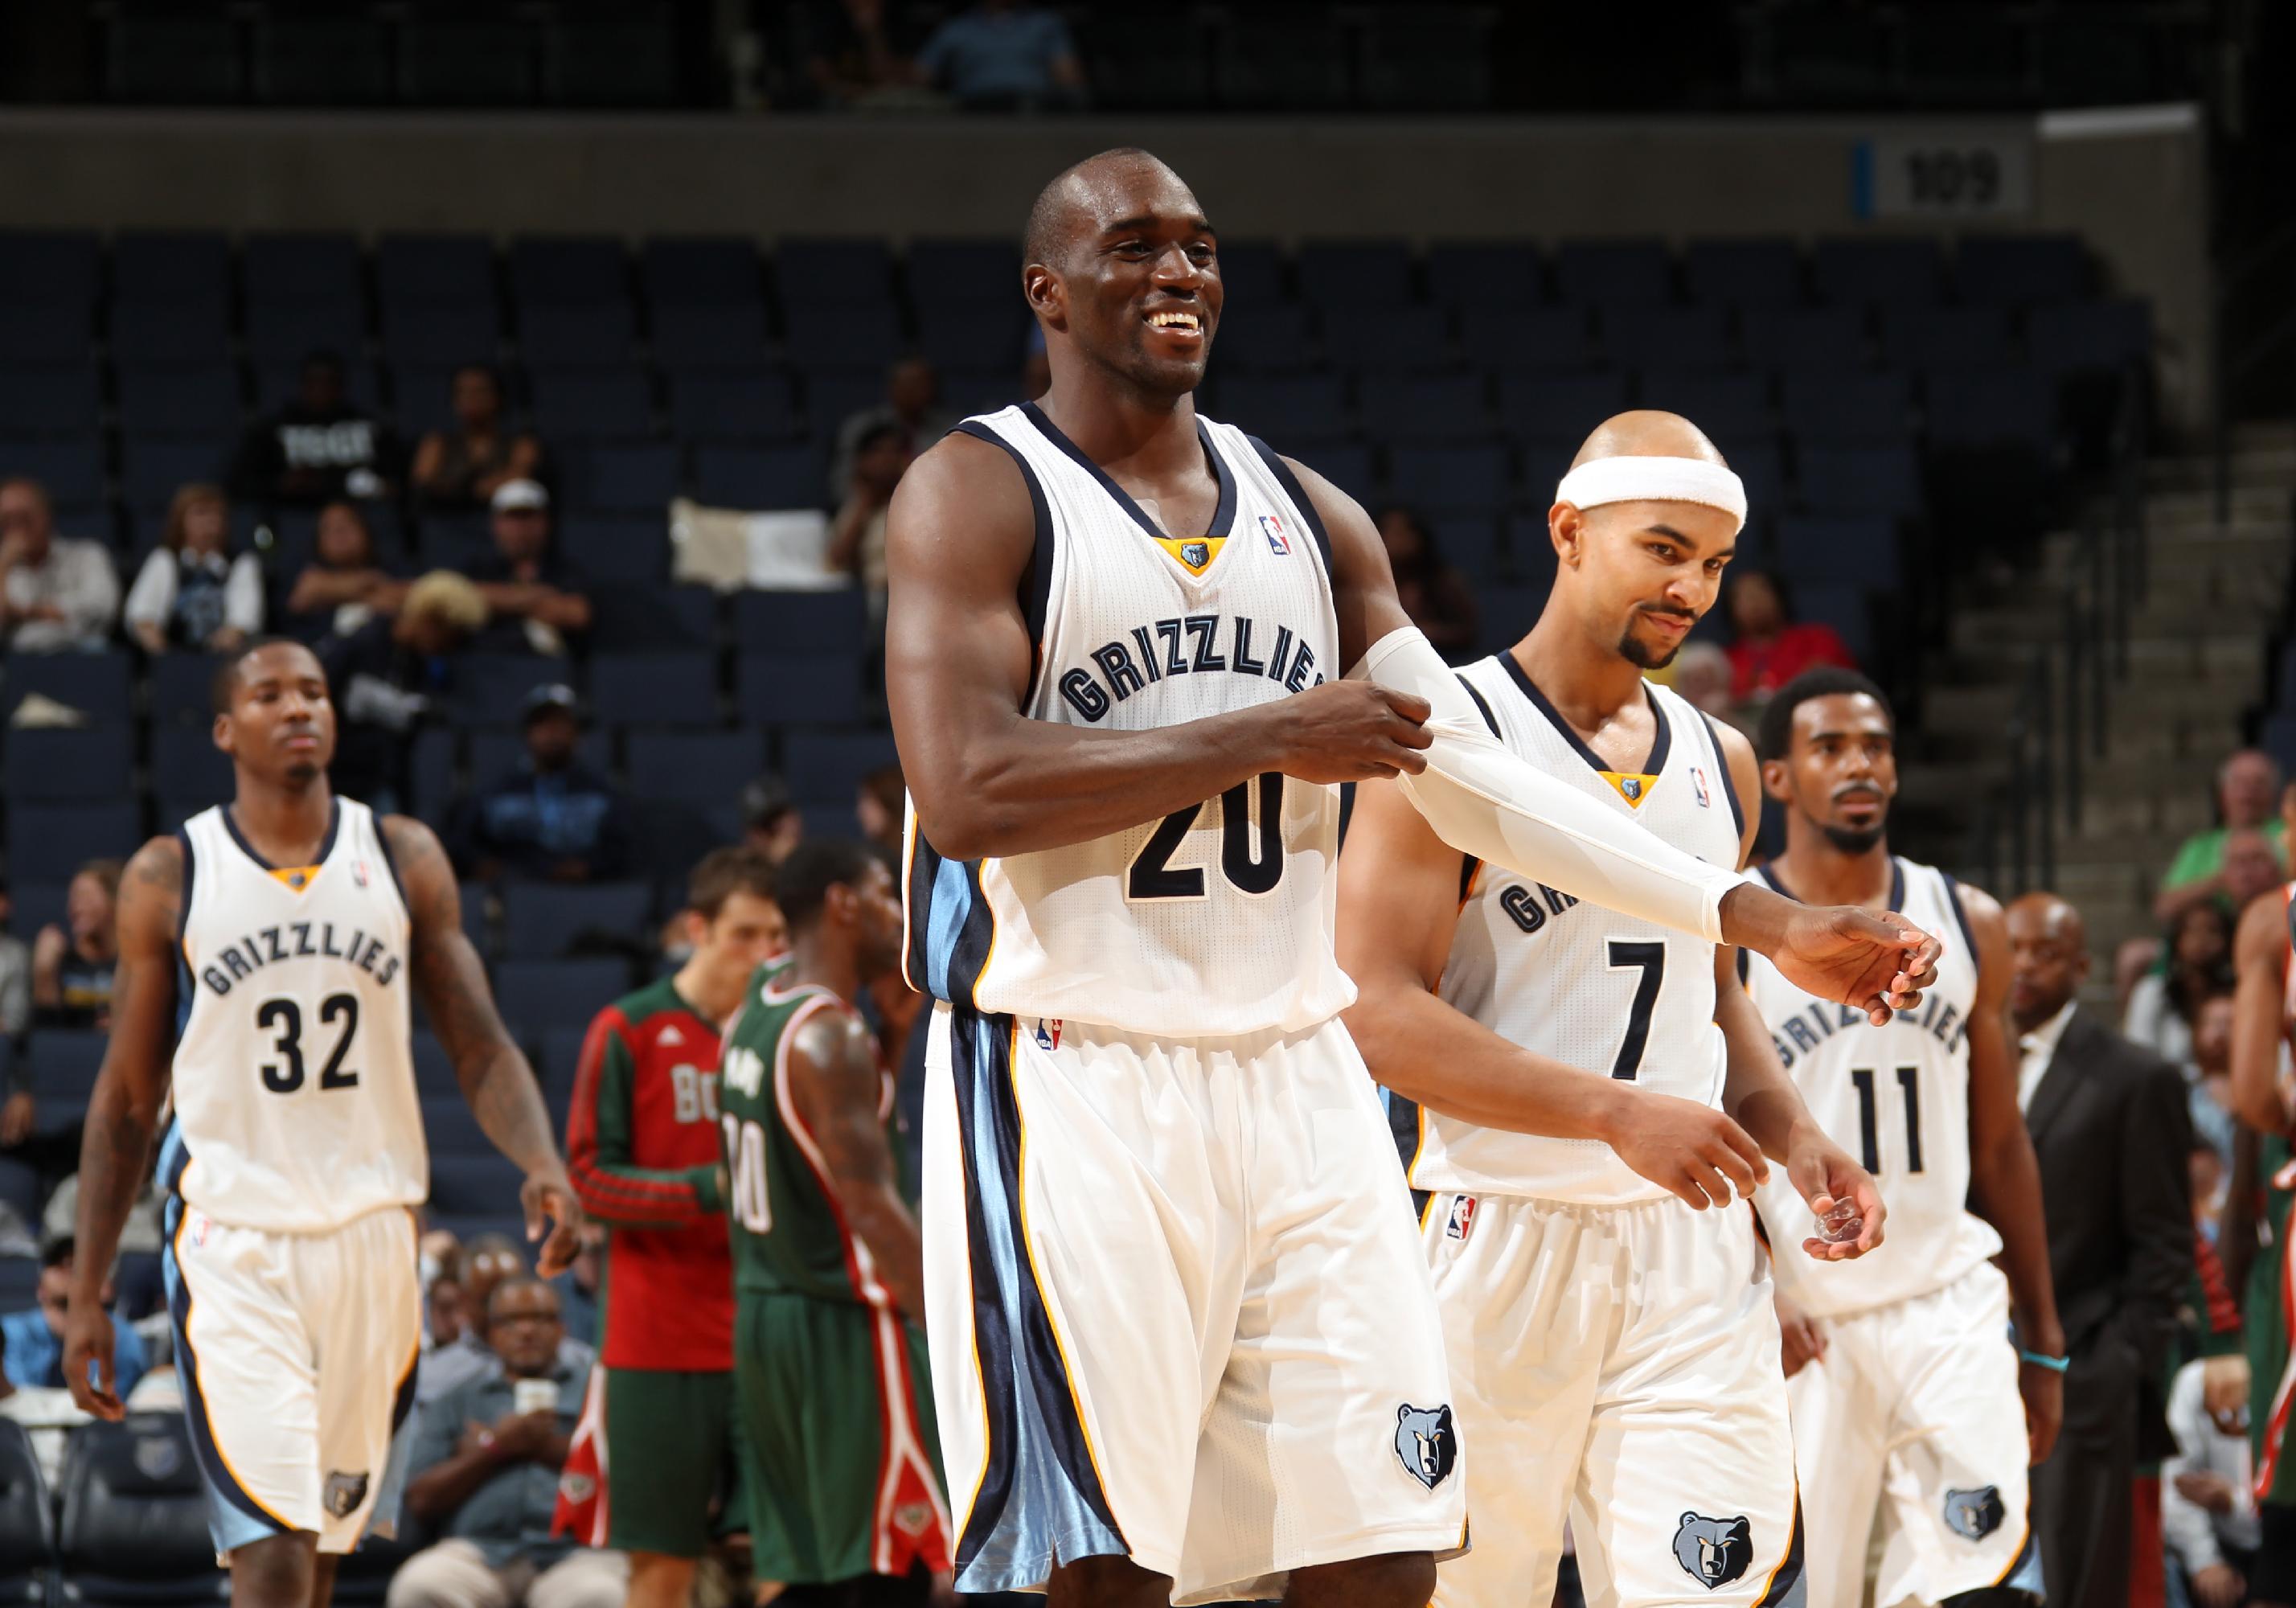 Late push leads Grizzlies past Bucks 102-99